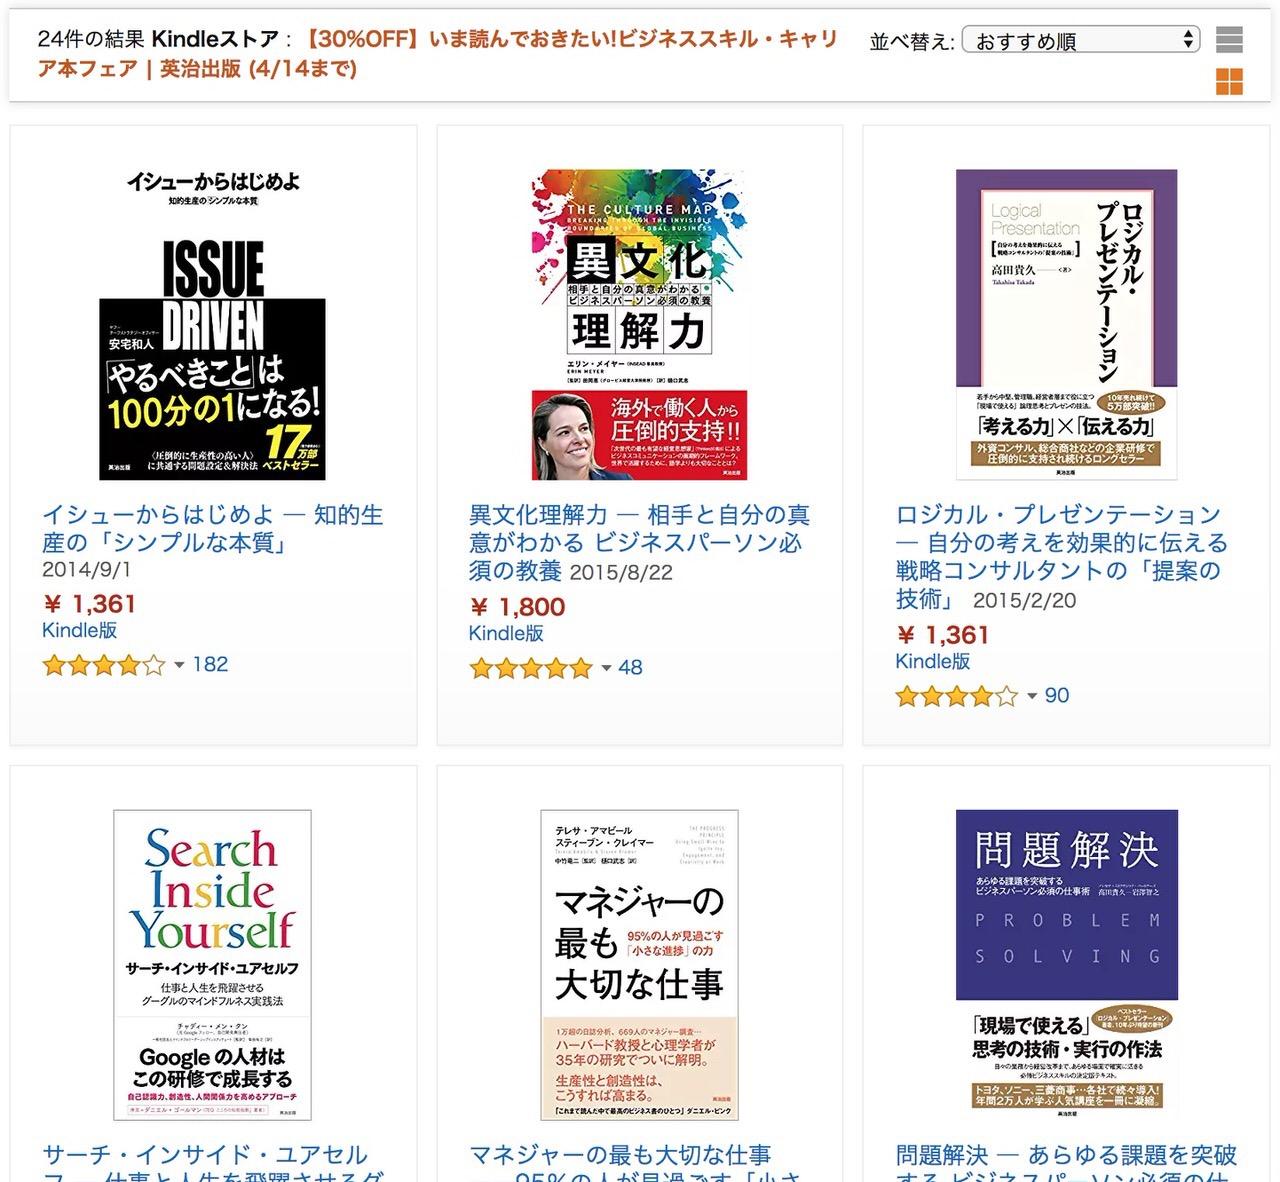 【Kindleセール】30%OFF「いま読んでおきたい!ビジネススキル・キャリア本フェア(英知出版)」(4/14まで)